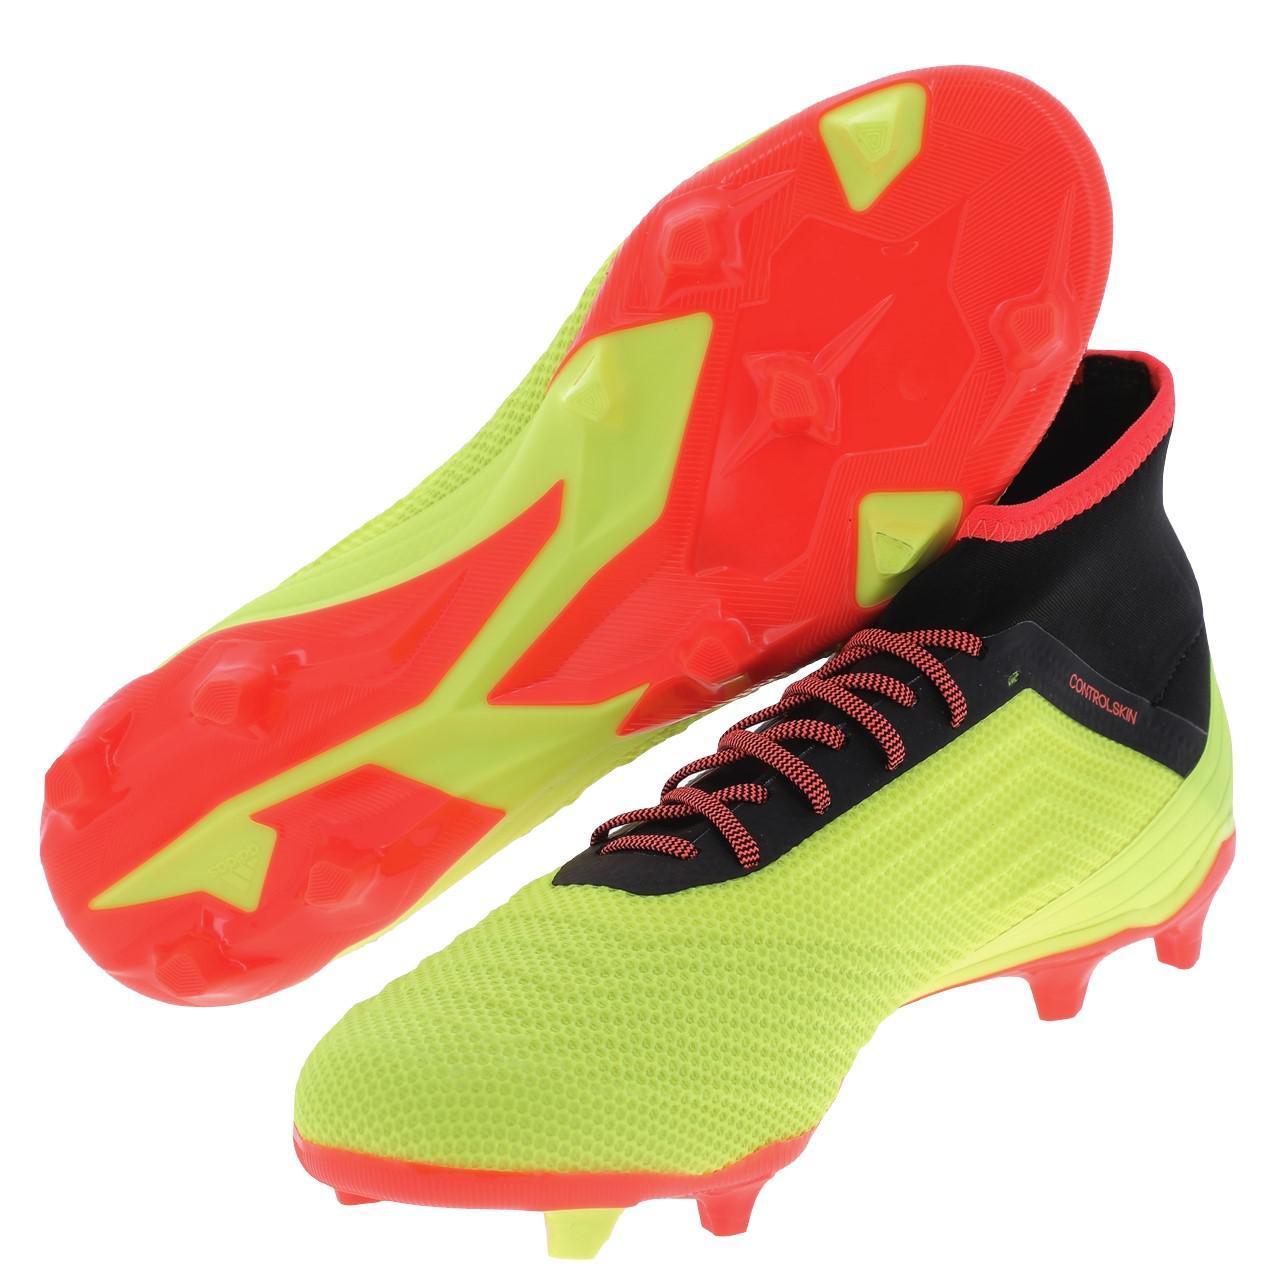 Détails sur Chaussures football lamelles Adidas Predator 18.2 fg jaune Jaune 47842 Neuf